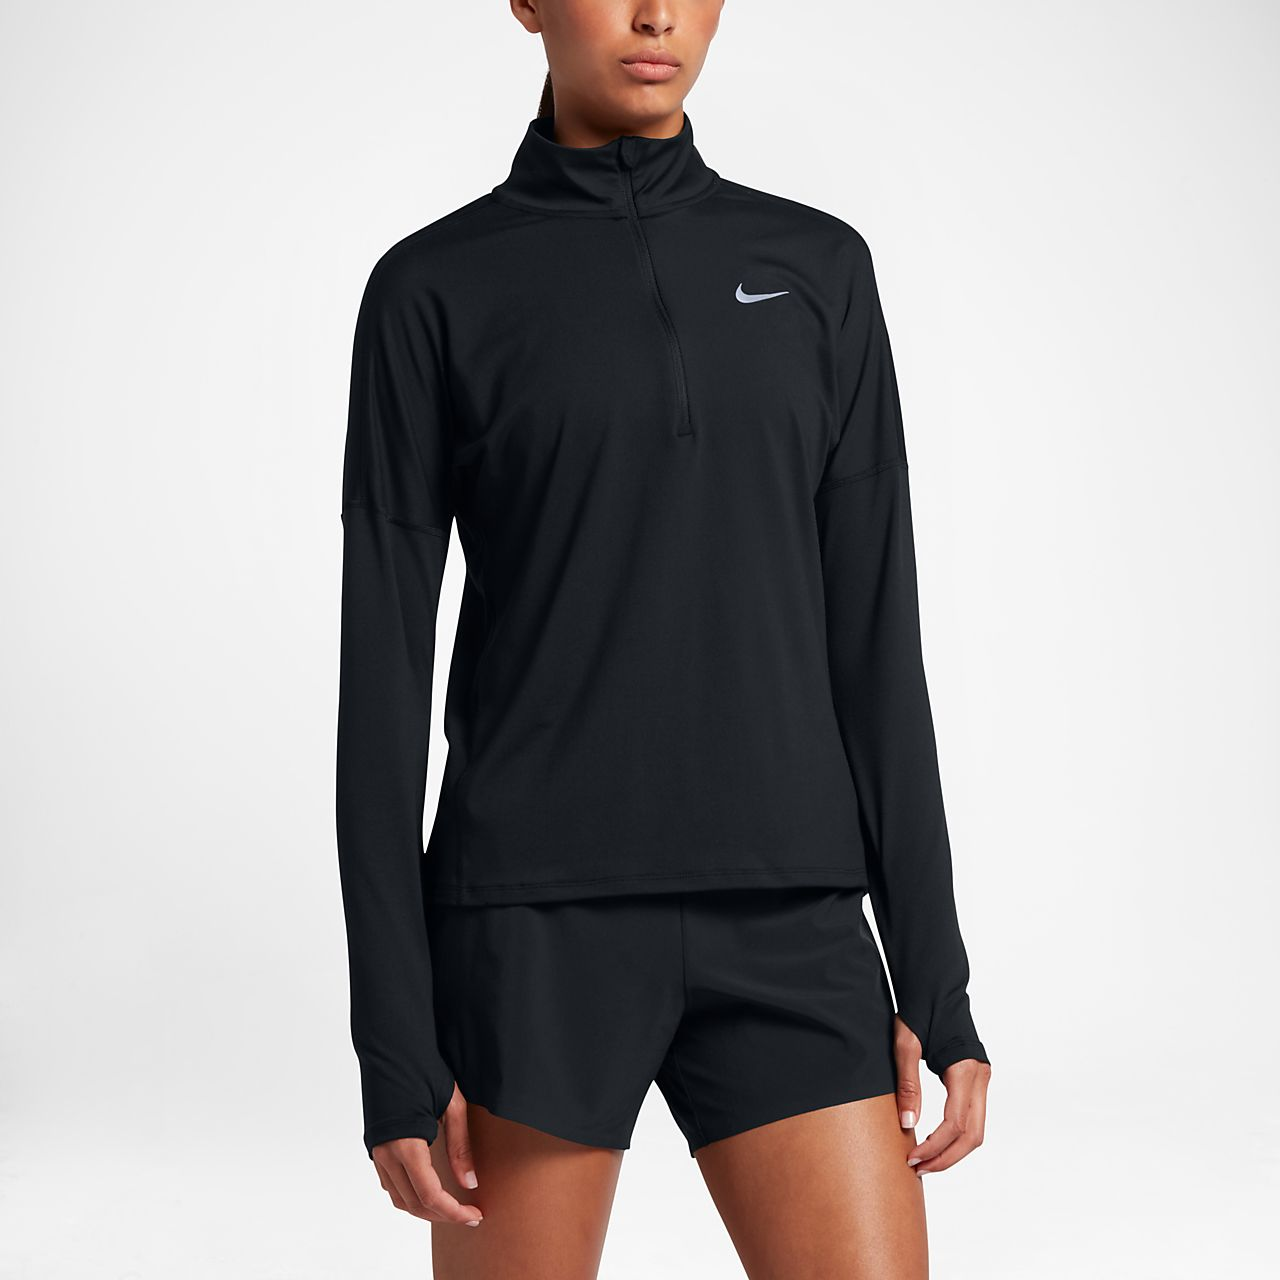 Nike Dri-FIT Element Women s Long-Sleeve Running Half-Zip Top. Nike ... da65b4c7c